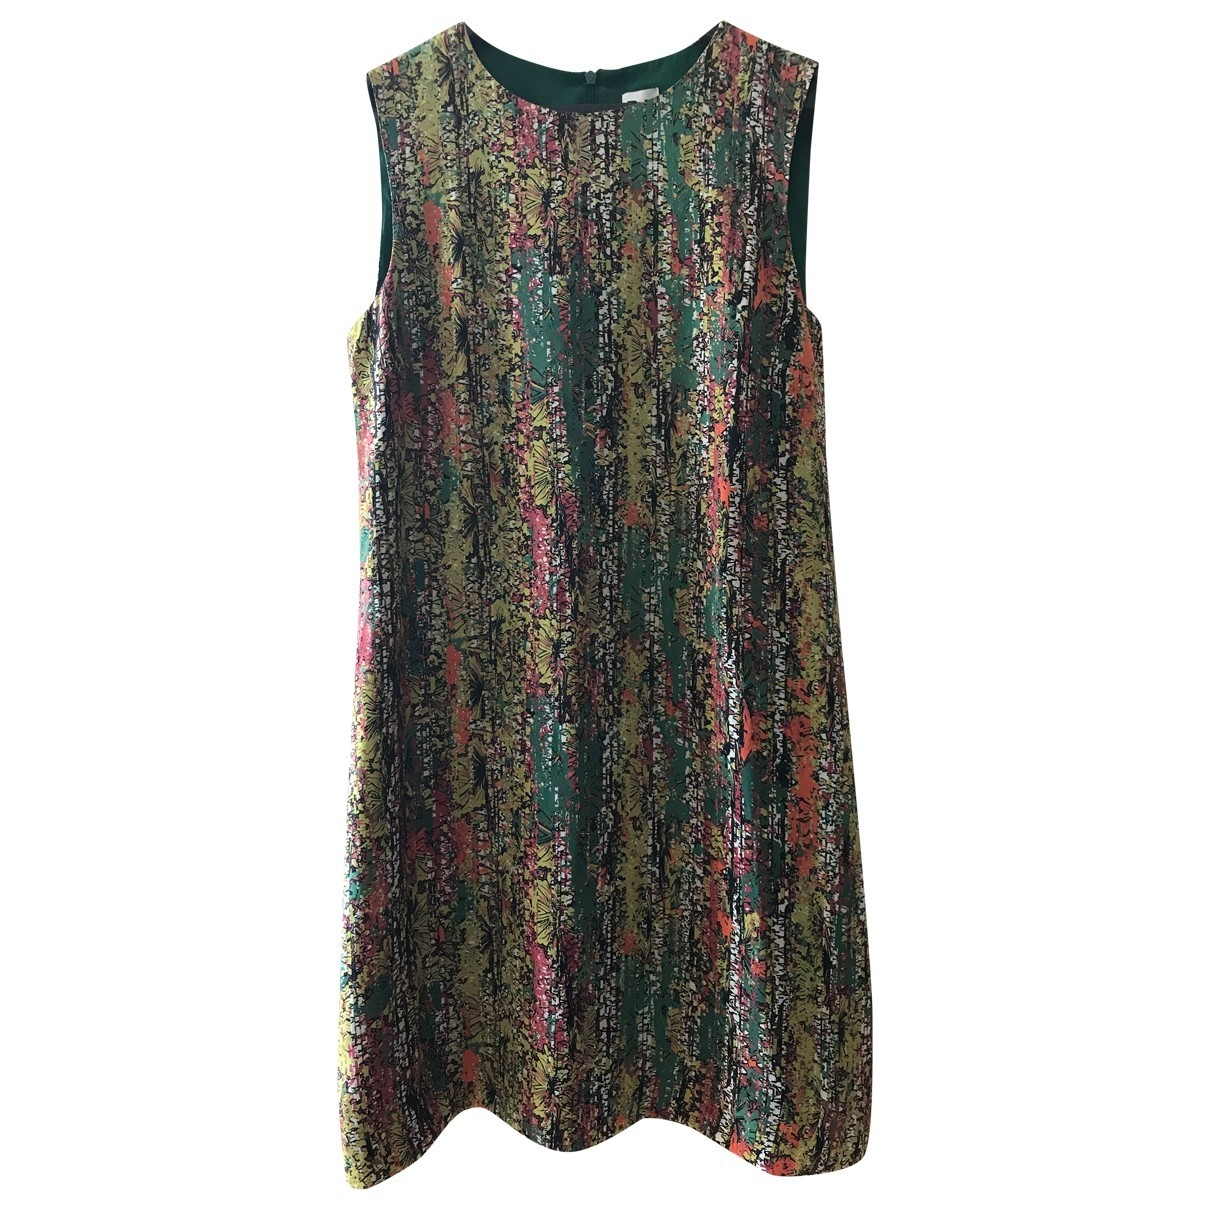 M Missoni \N Multicolour Silk dress for Women 40 IT